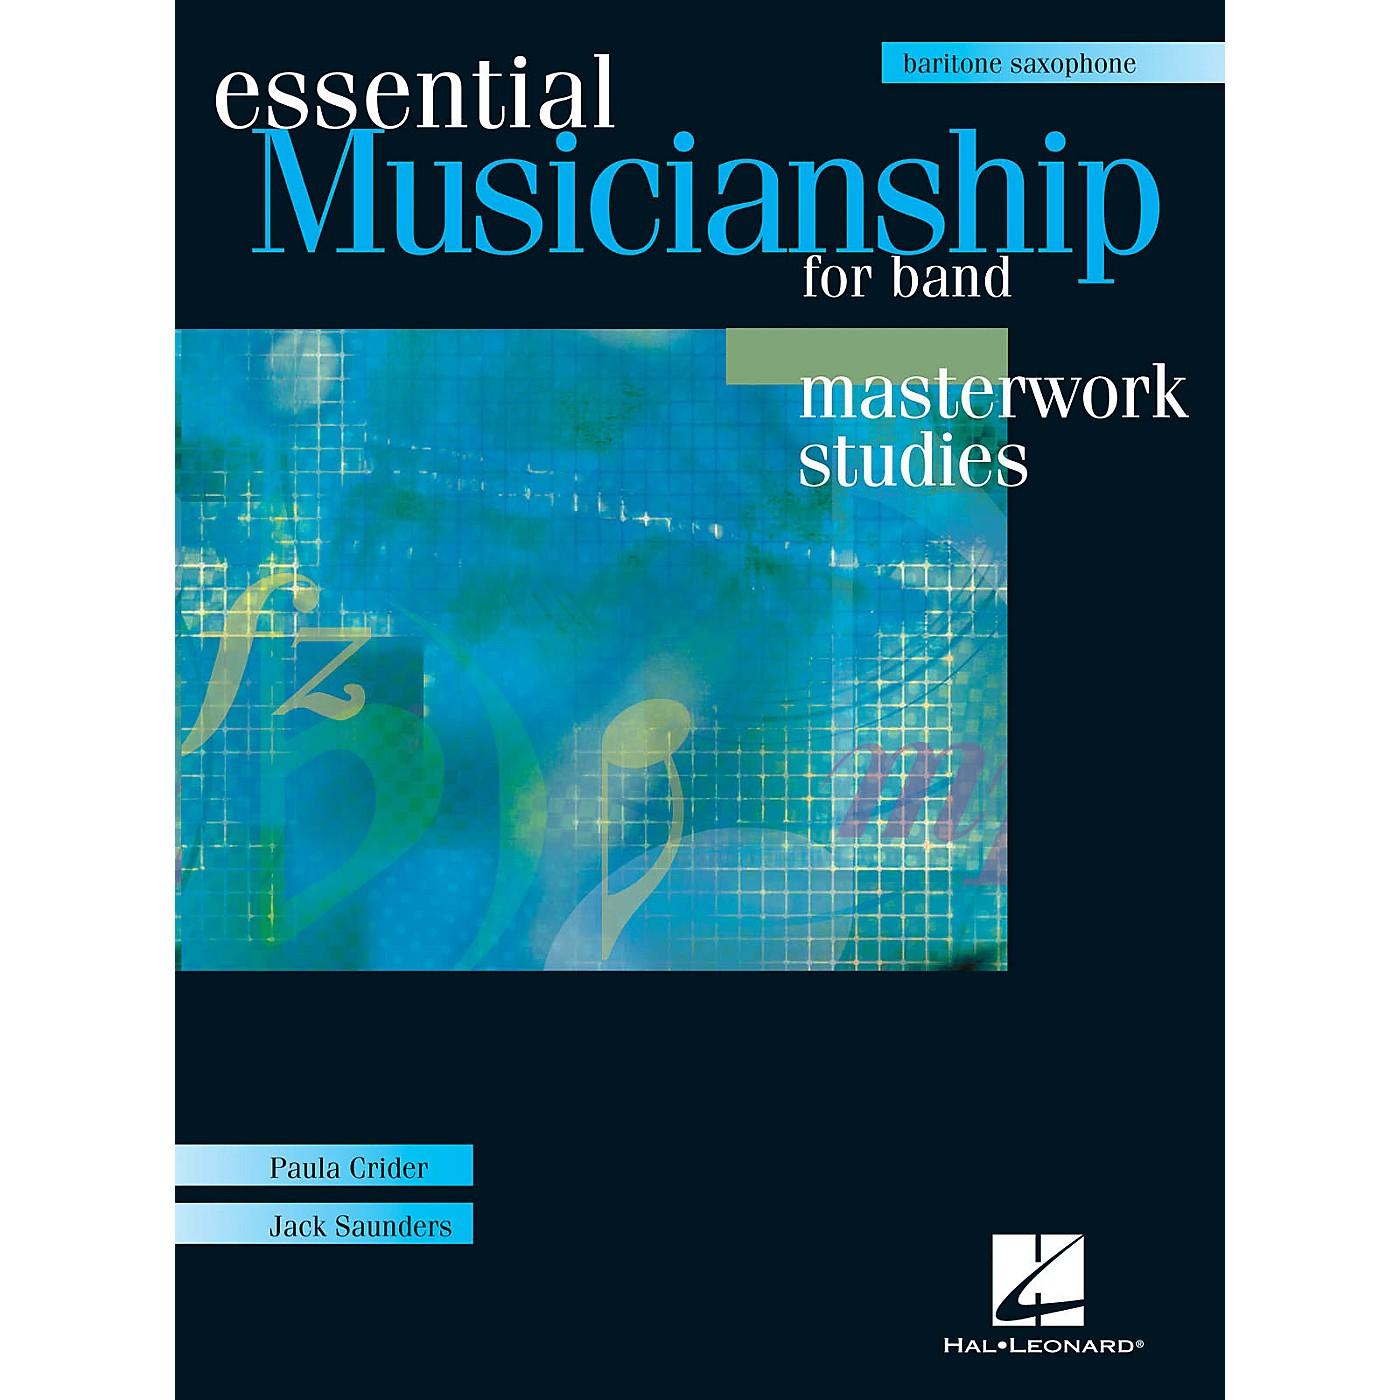 Hal Leonard Essential Musicianship for Band - Masterwork Studies (Baritone Saxophone) Concert Band thumbnail